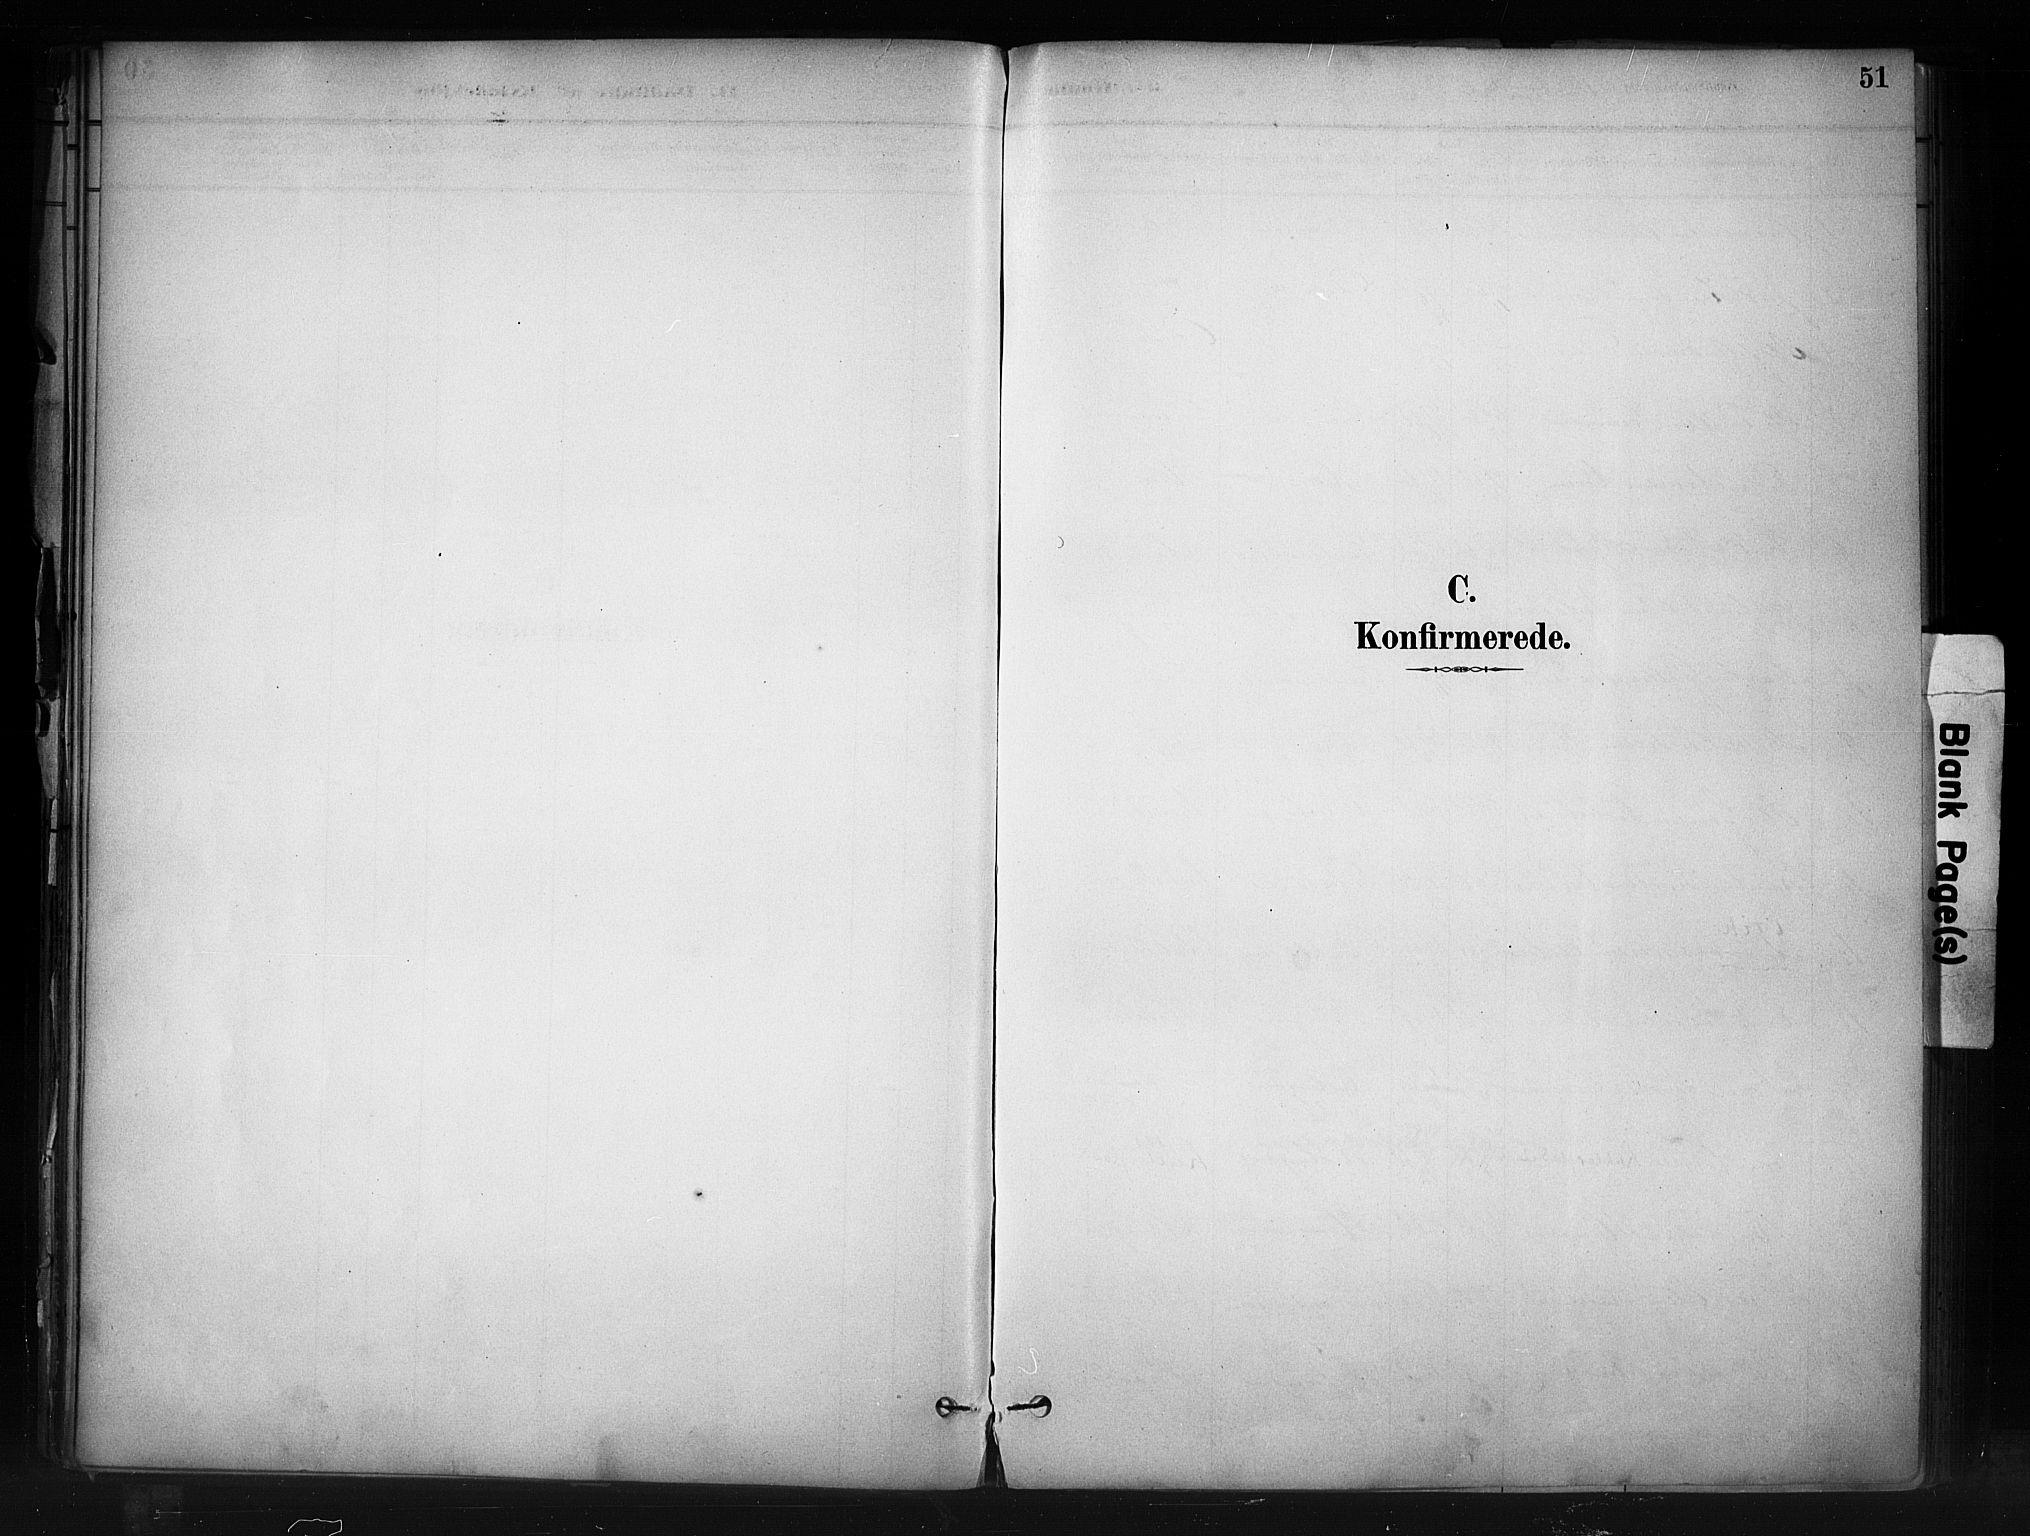 SAH, Nord-Aurdal prestekontor, Ministerialbok nr. 13, 1883-1895, s. 51